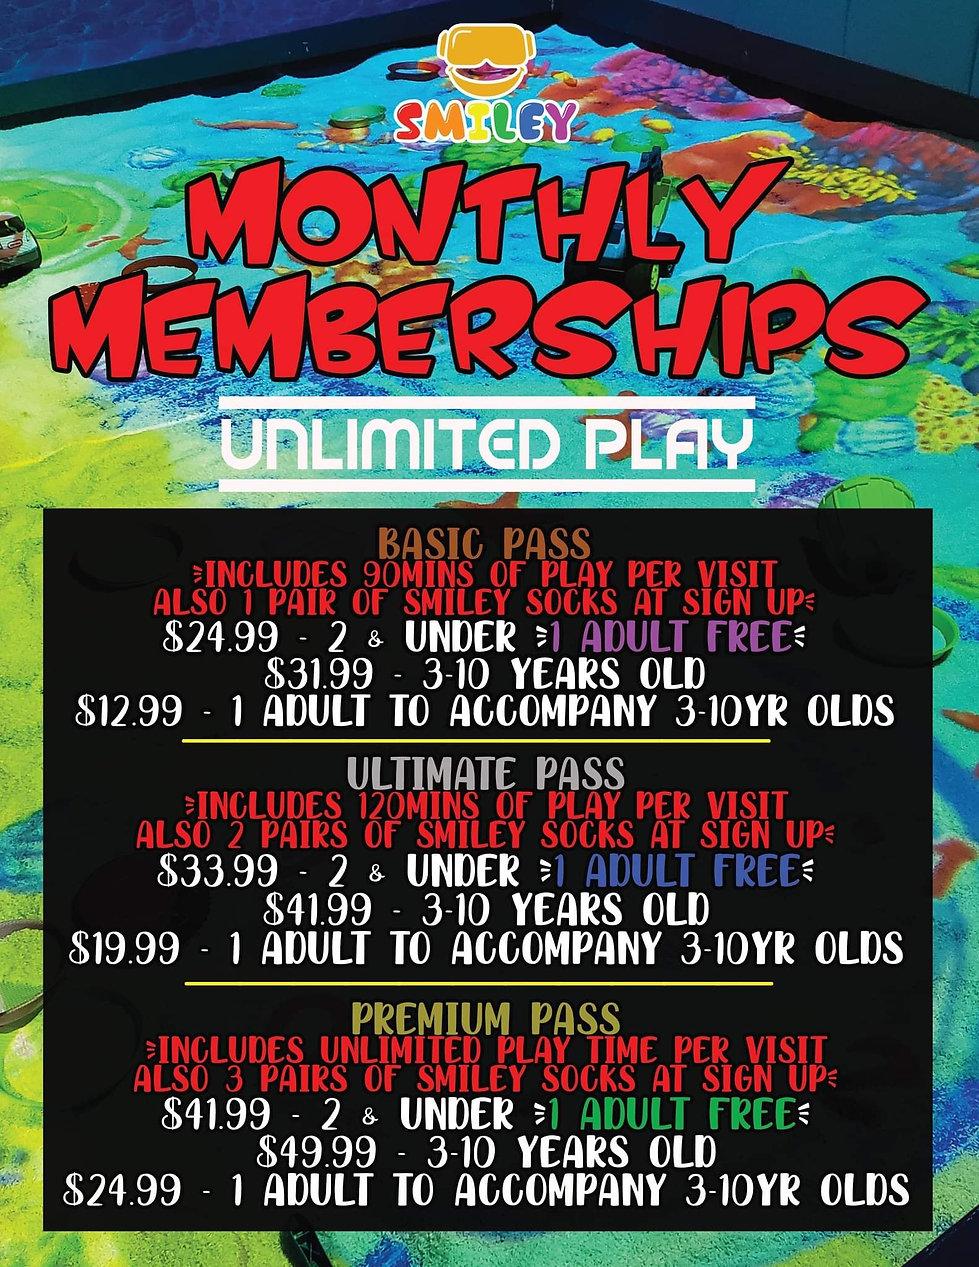 Monthly Membership Flyer.jpg